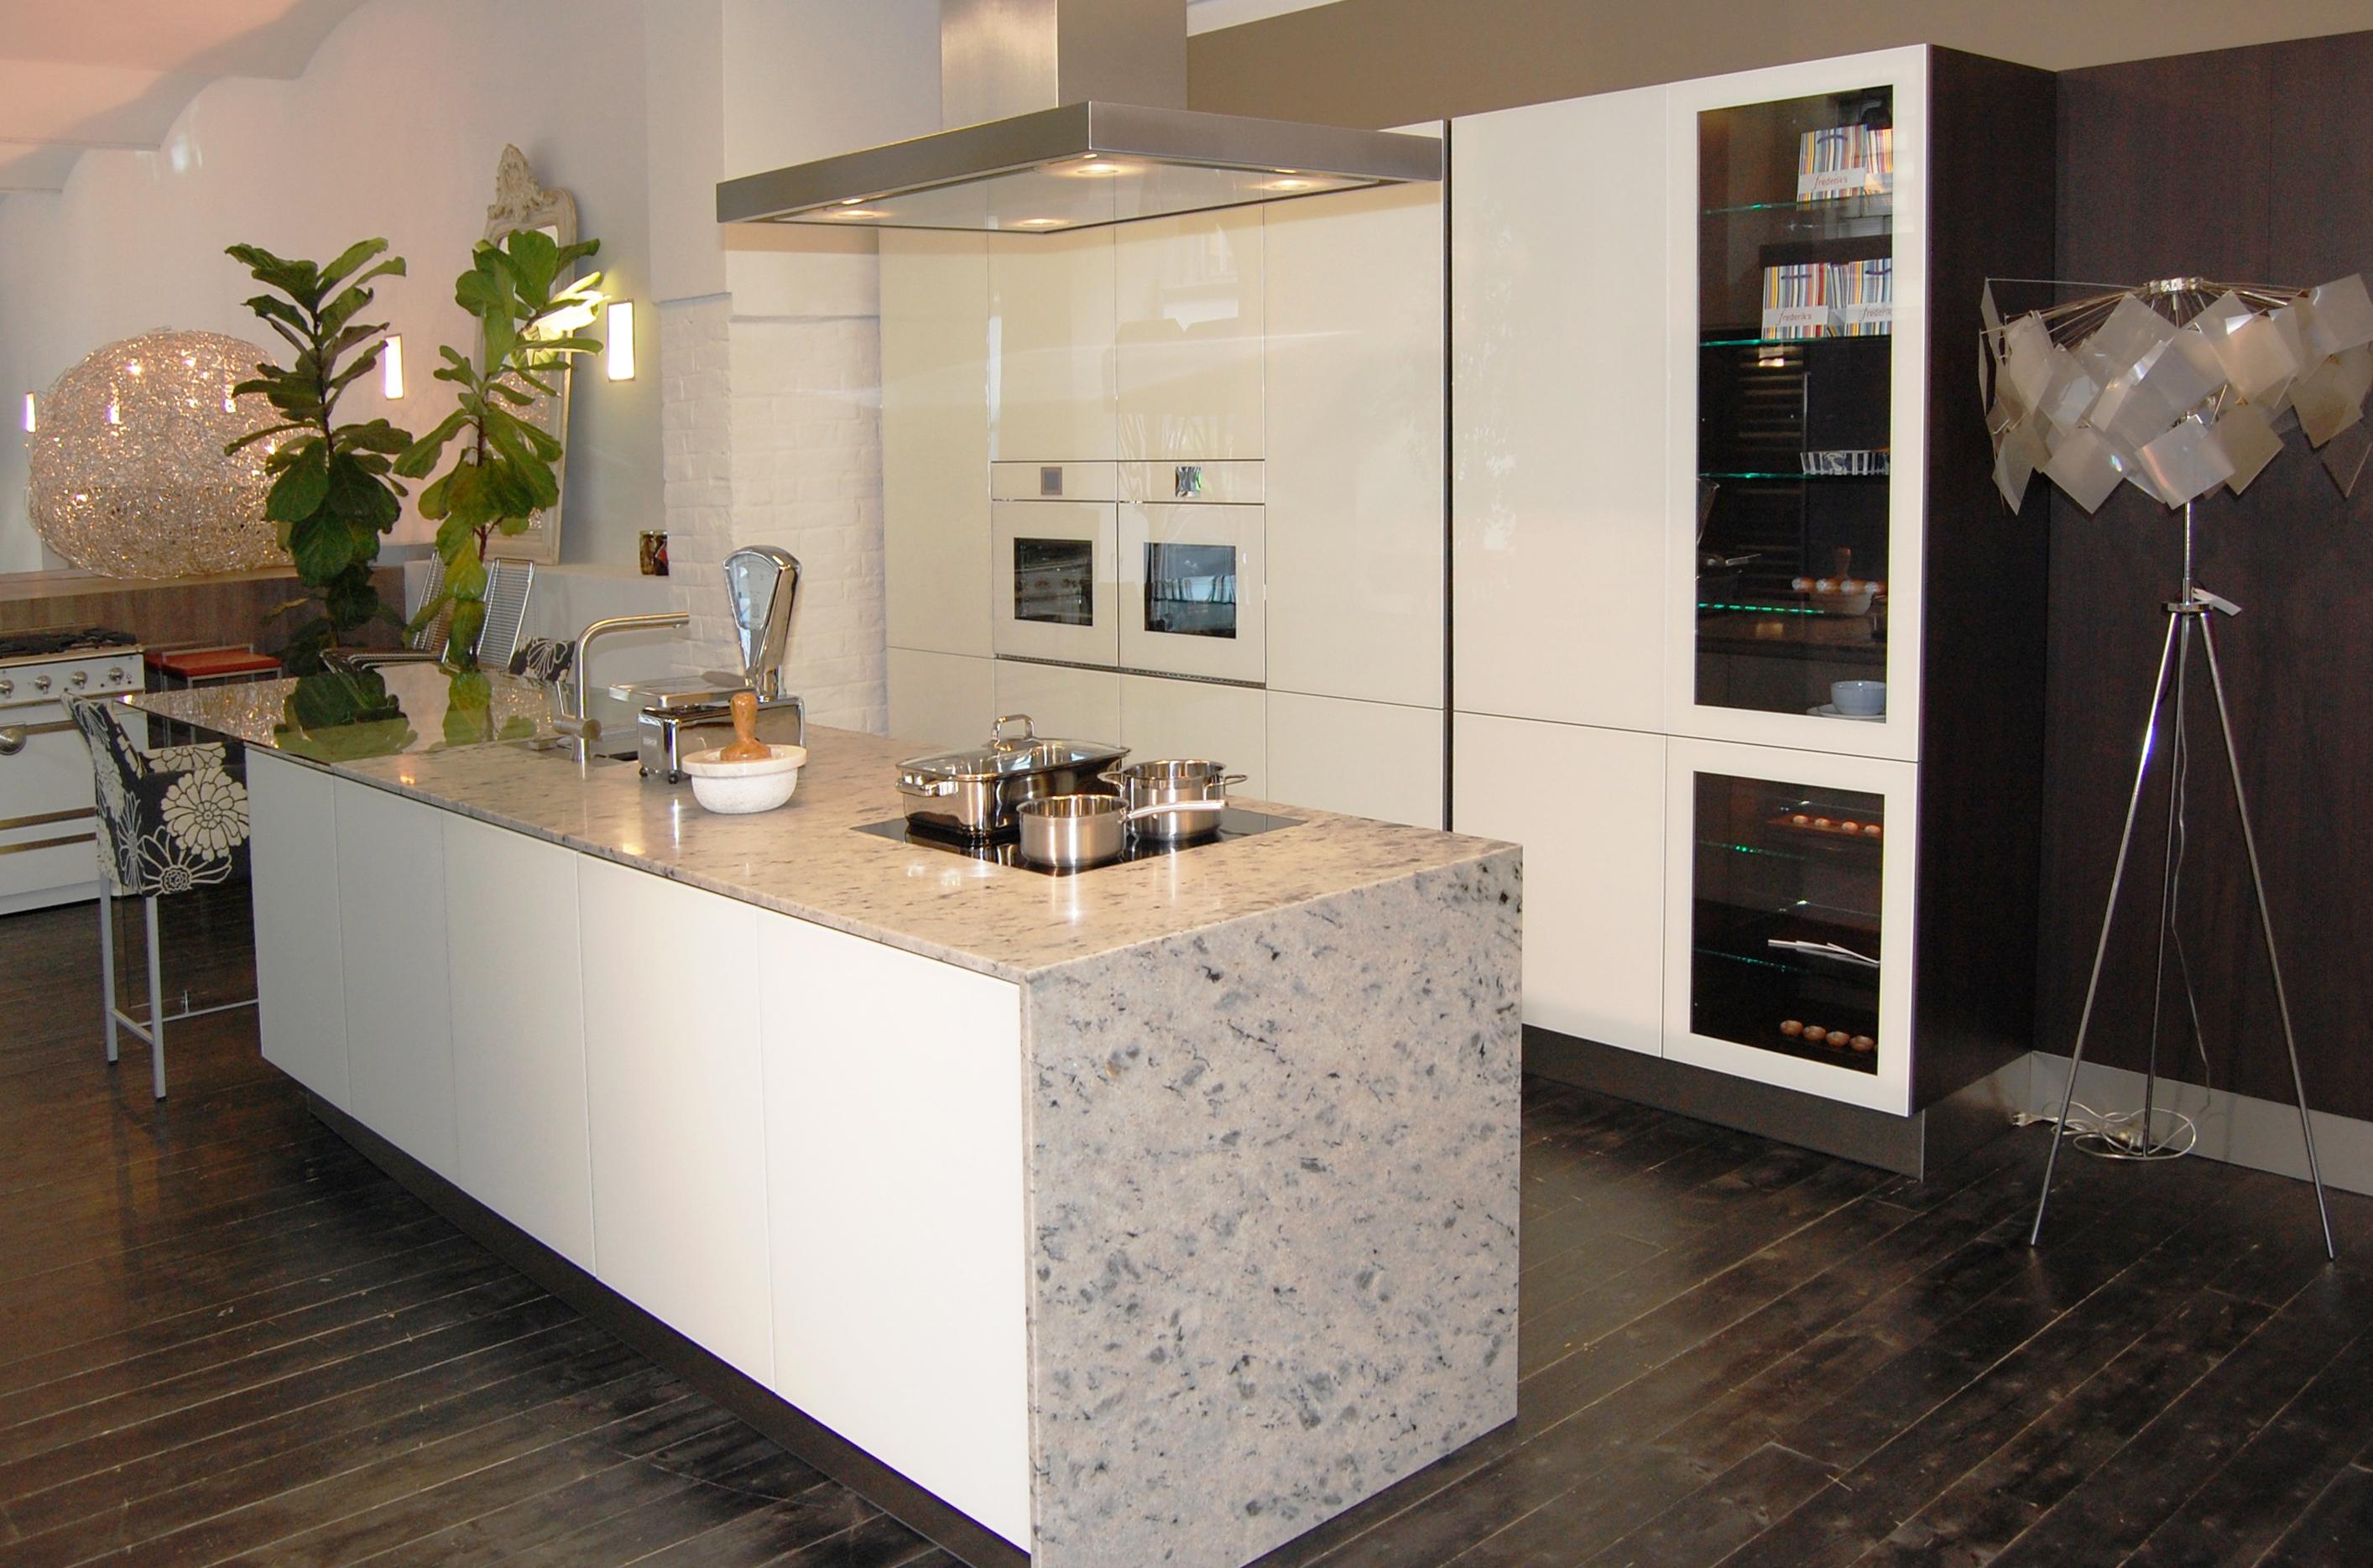 ausstellungsk che eggersmann e sign vetro vetro satinato. Black Bedroom Furniture Sets. Home Design Ideas